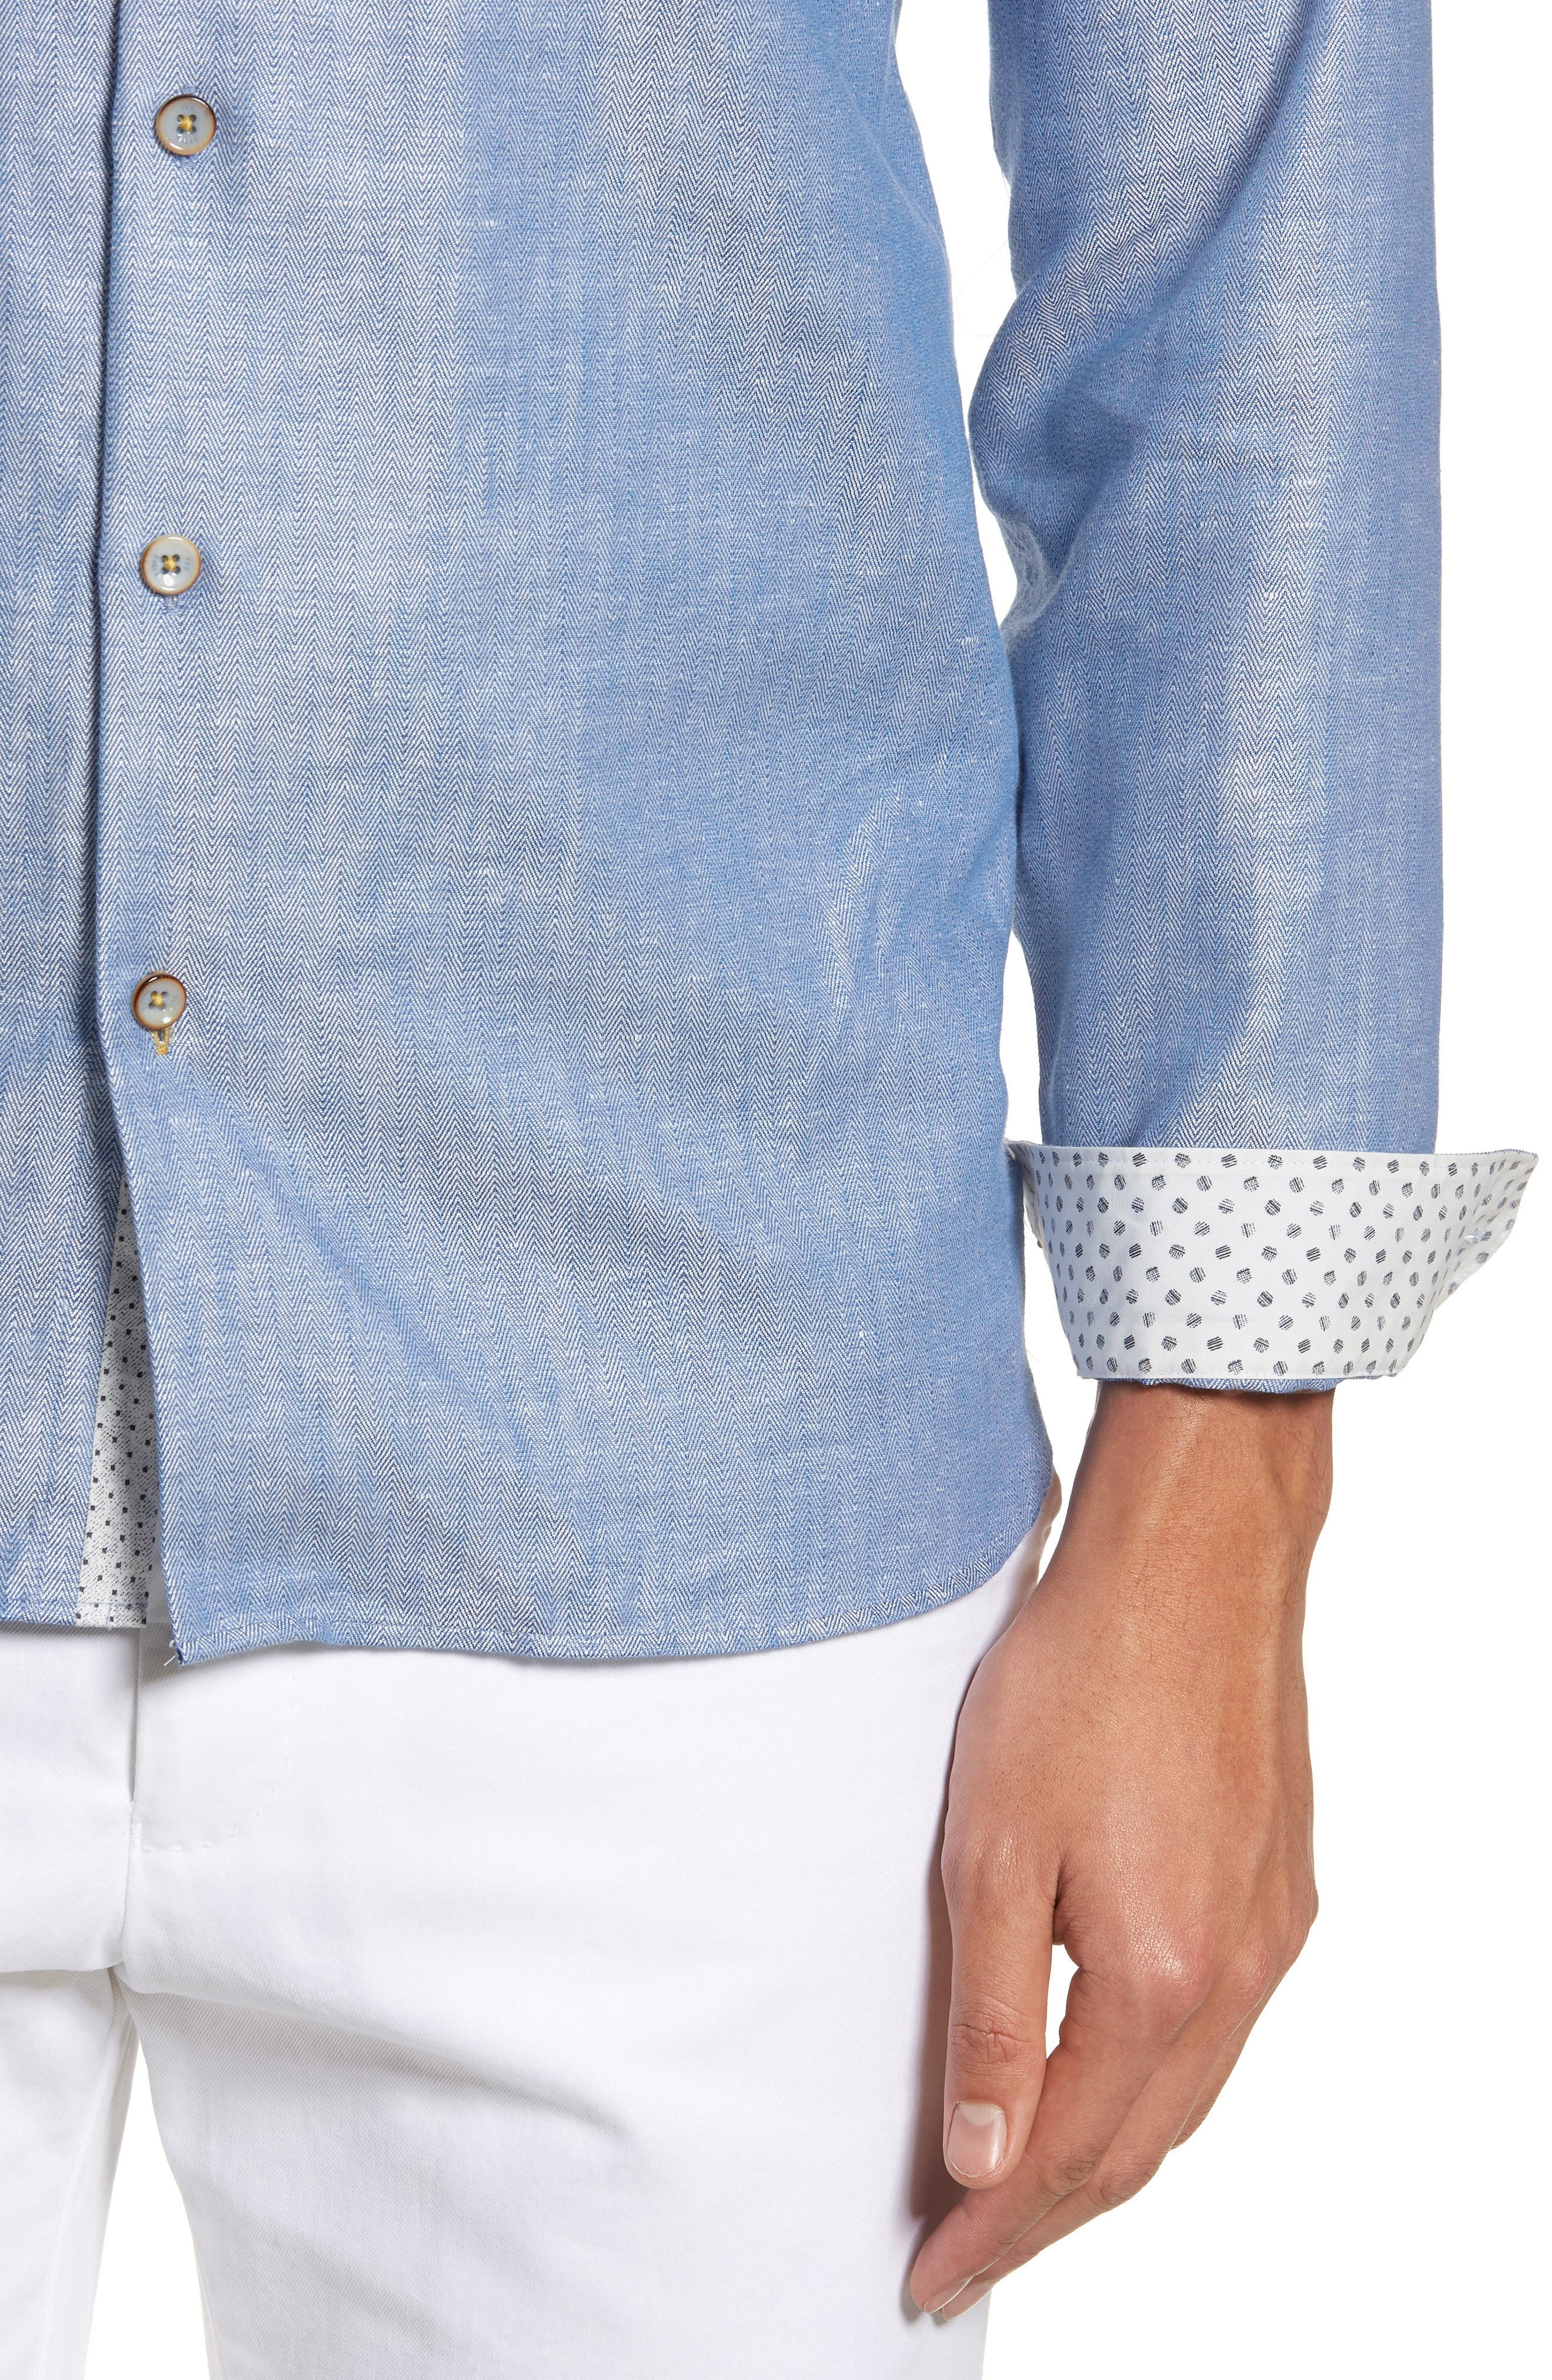 Linlins Herringbone Cotton & Linen Sport Shirt,                             Alternate thumbnail 18, color,